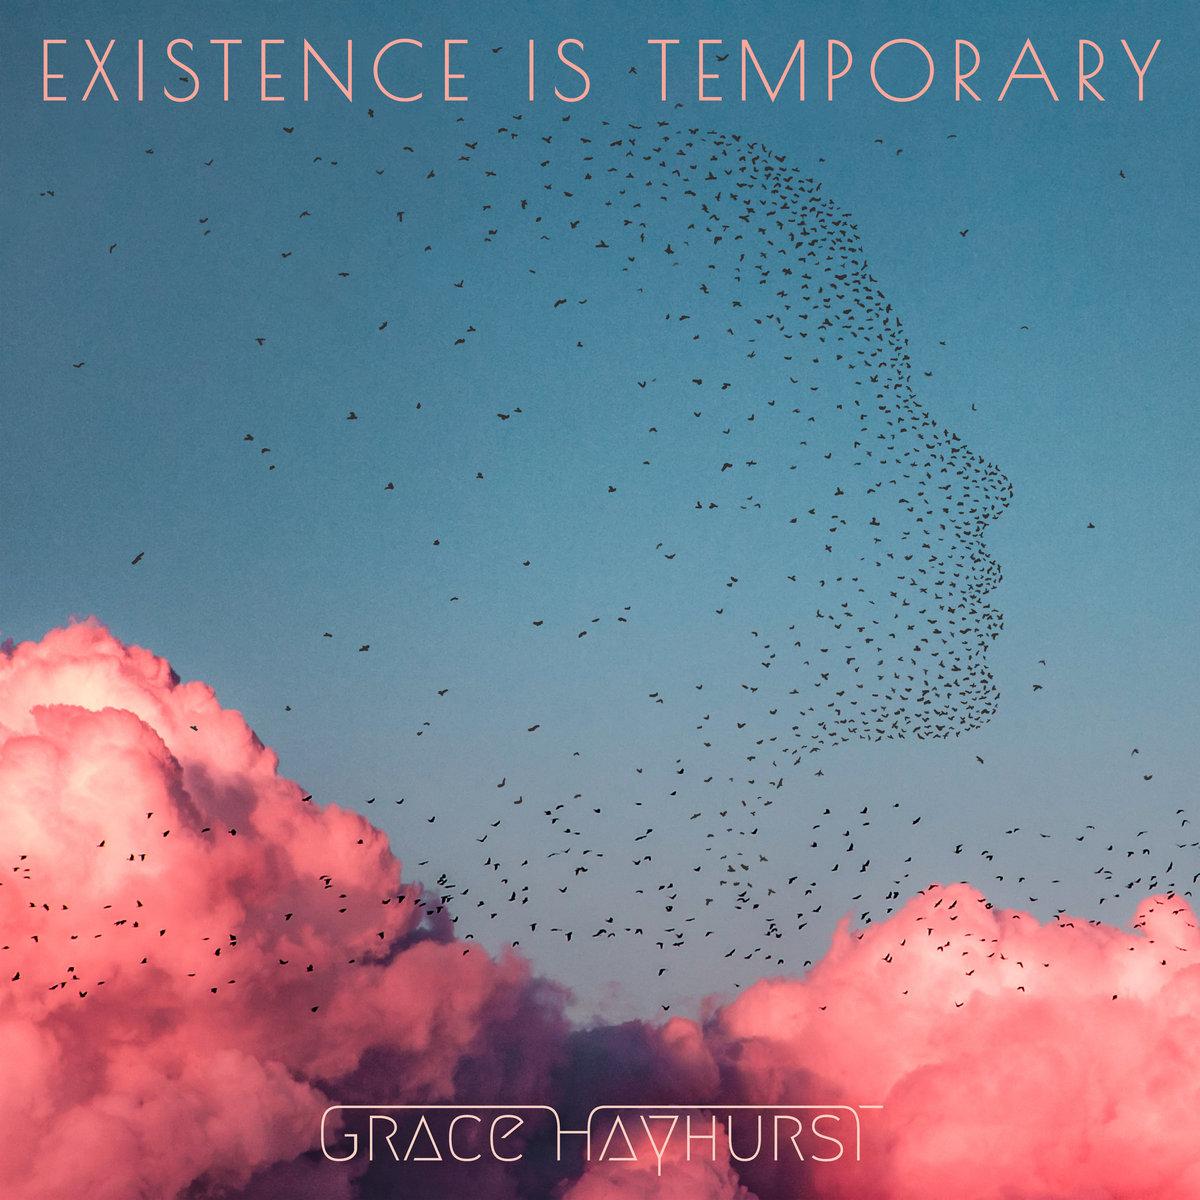 GraceHayhurst_ExistenceIsTemporary